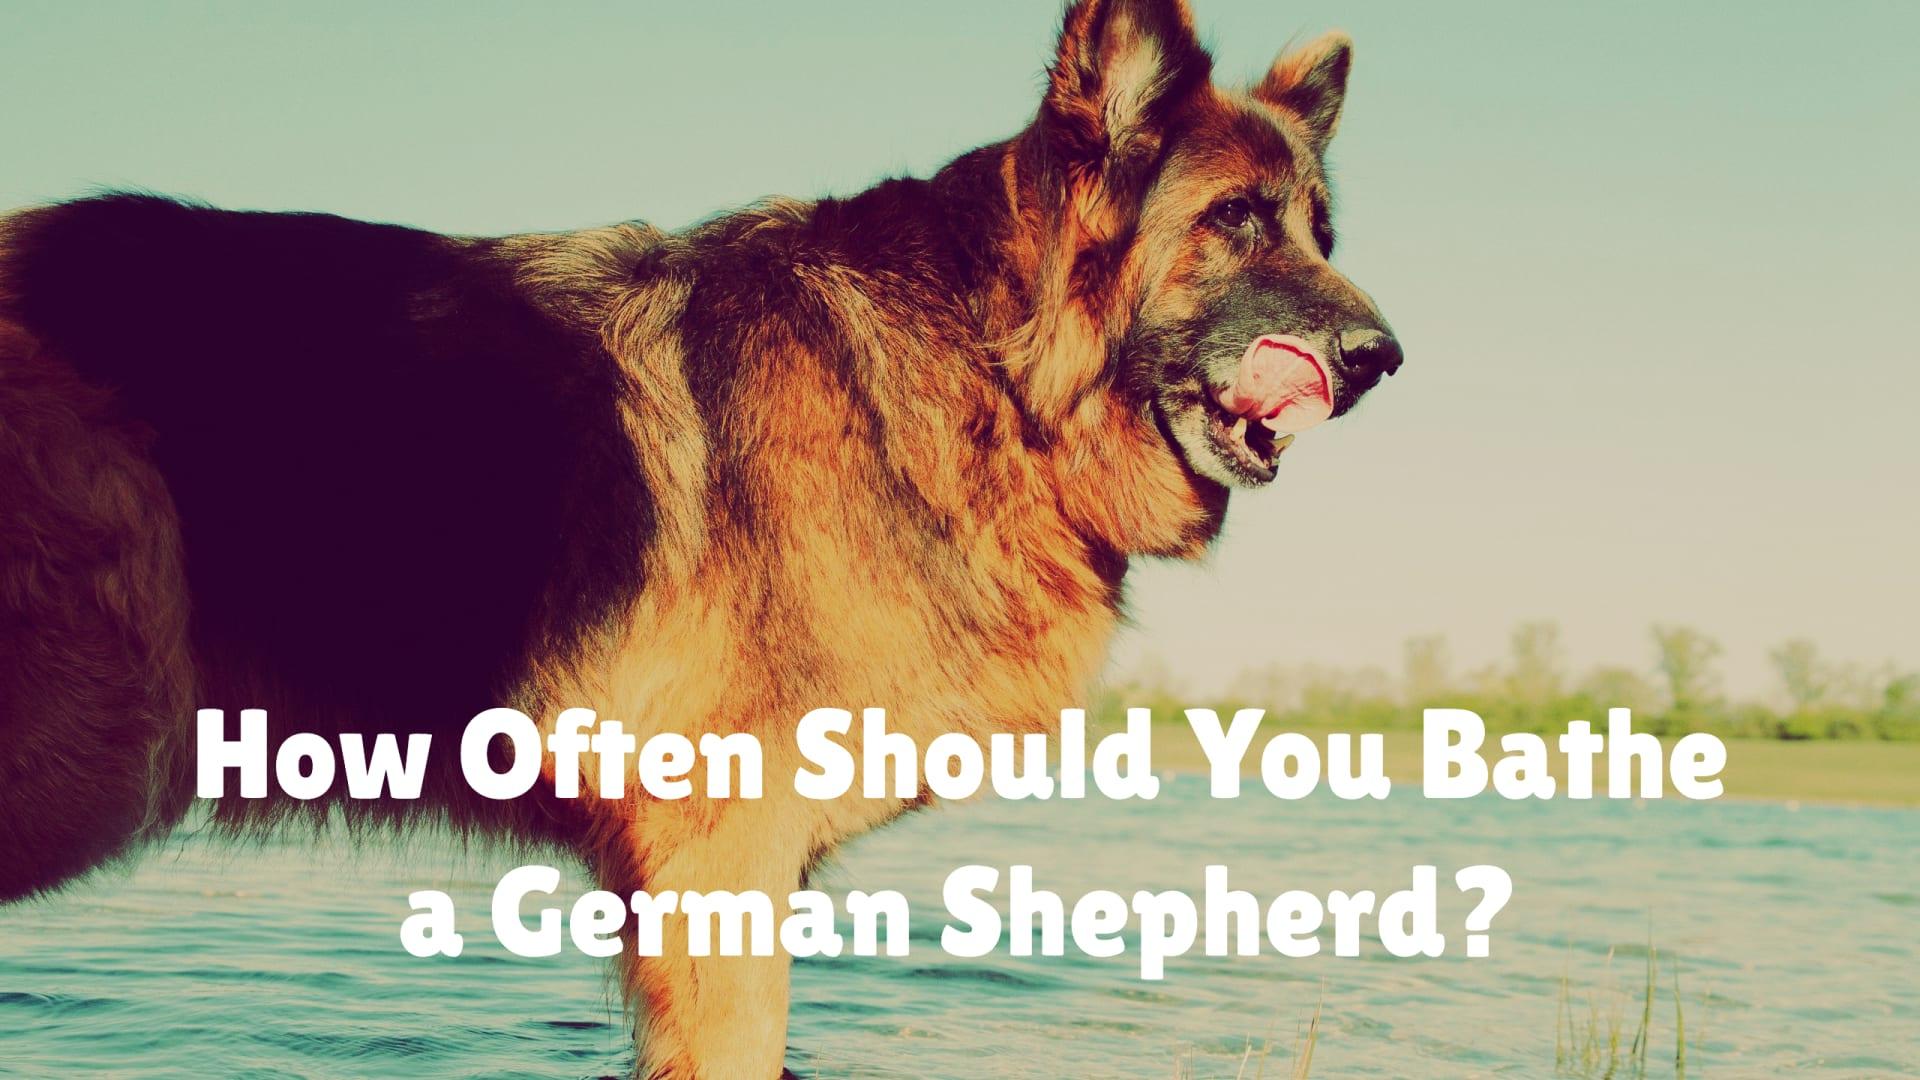 How Often Should You Bathe a German Shepherd?